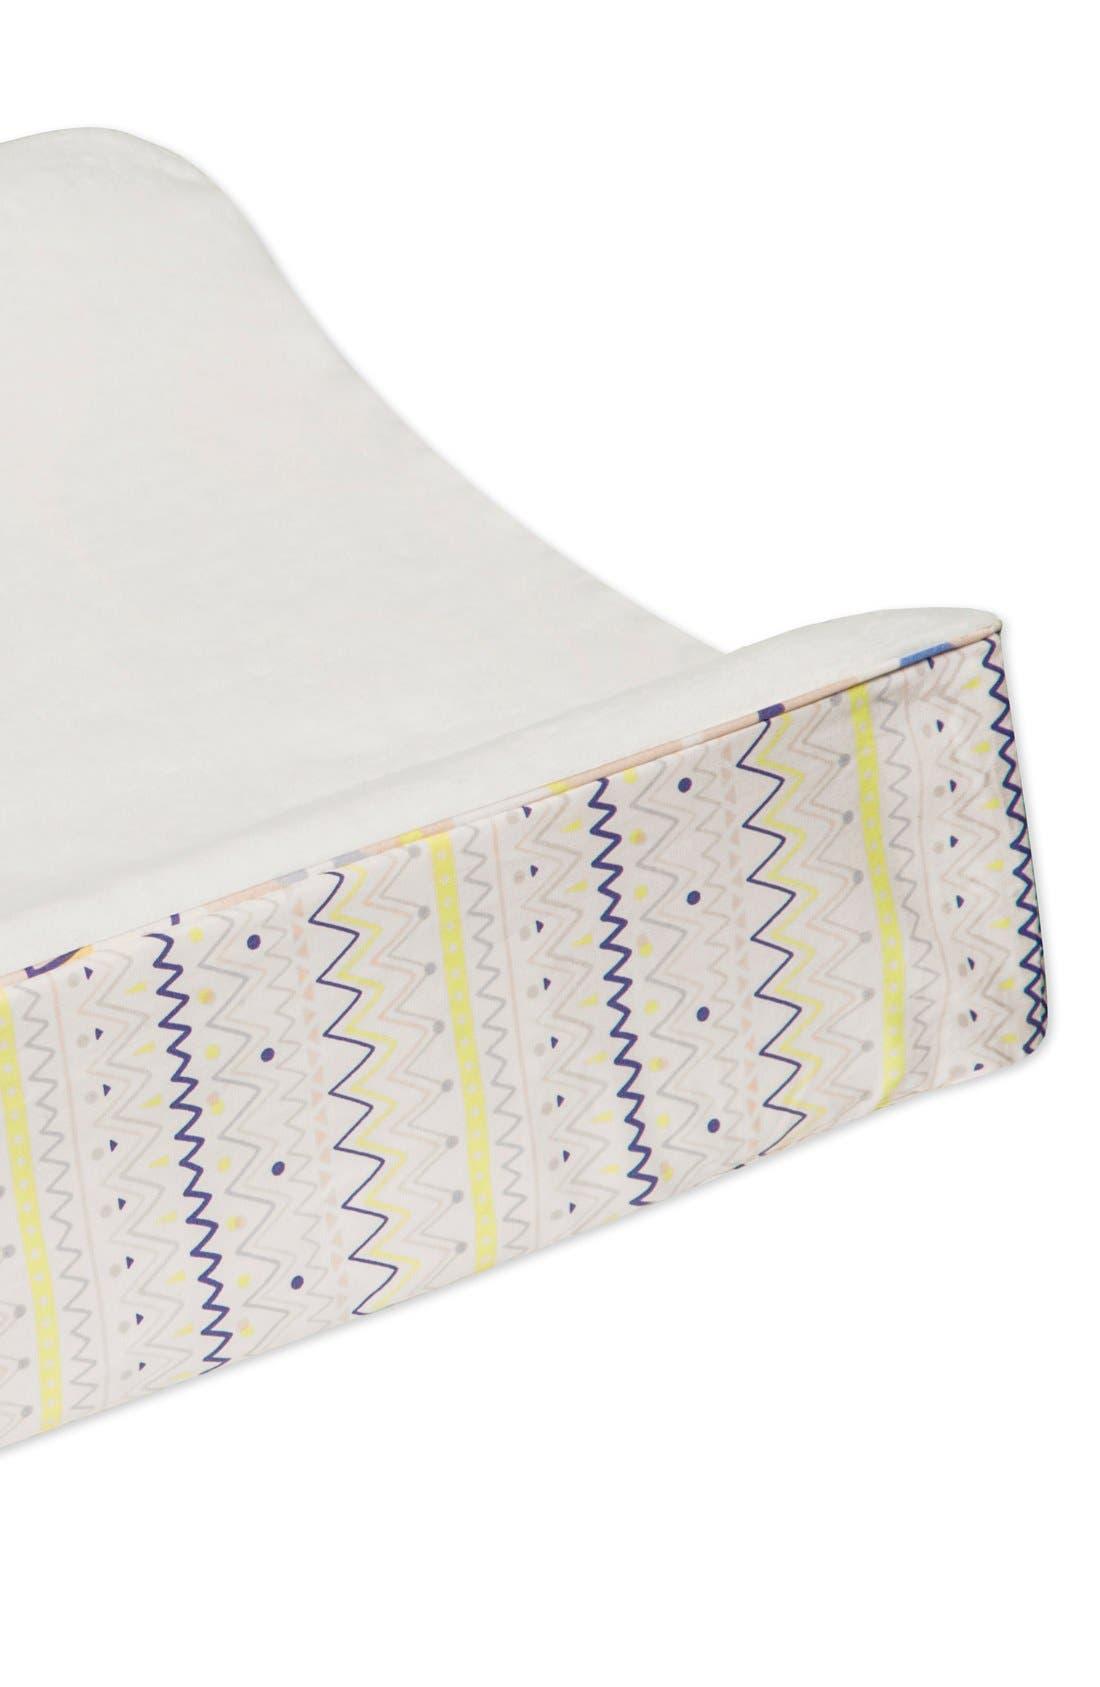 'Desert' Crib Sheet, Crib Skirt, Changing Pad Cover, Play Blanket, Stroller Blanket & Wall Decals,                             Alternate thumbnail 2, color,                             OFF WHITE